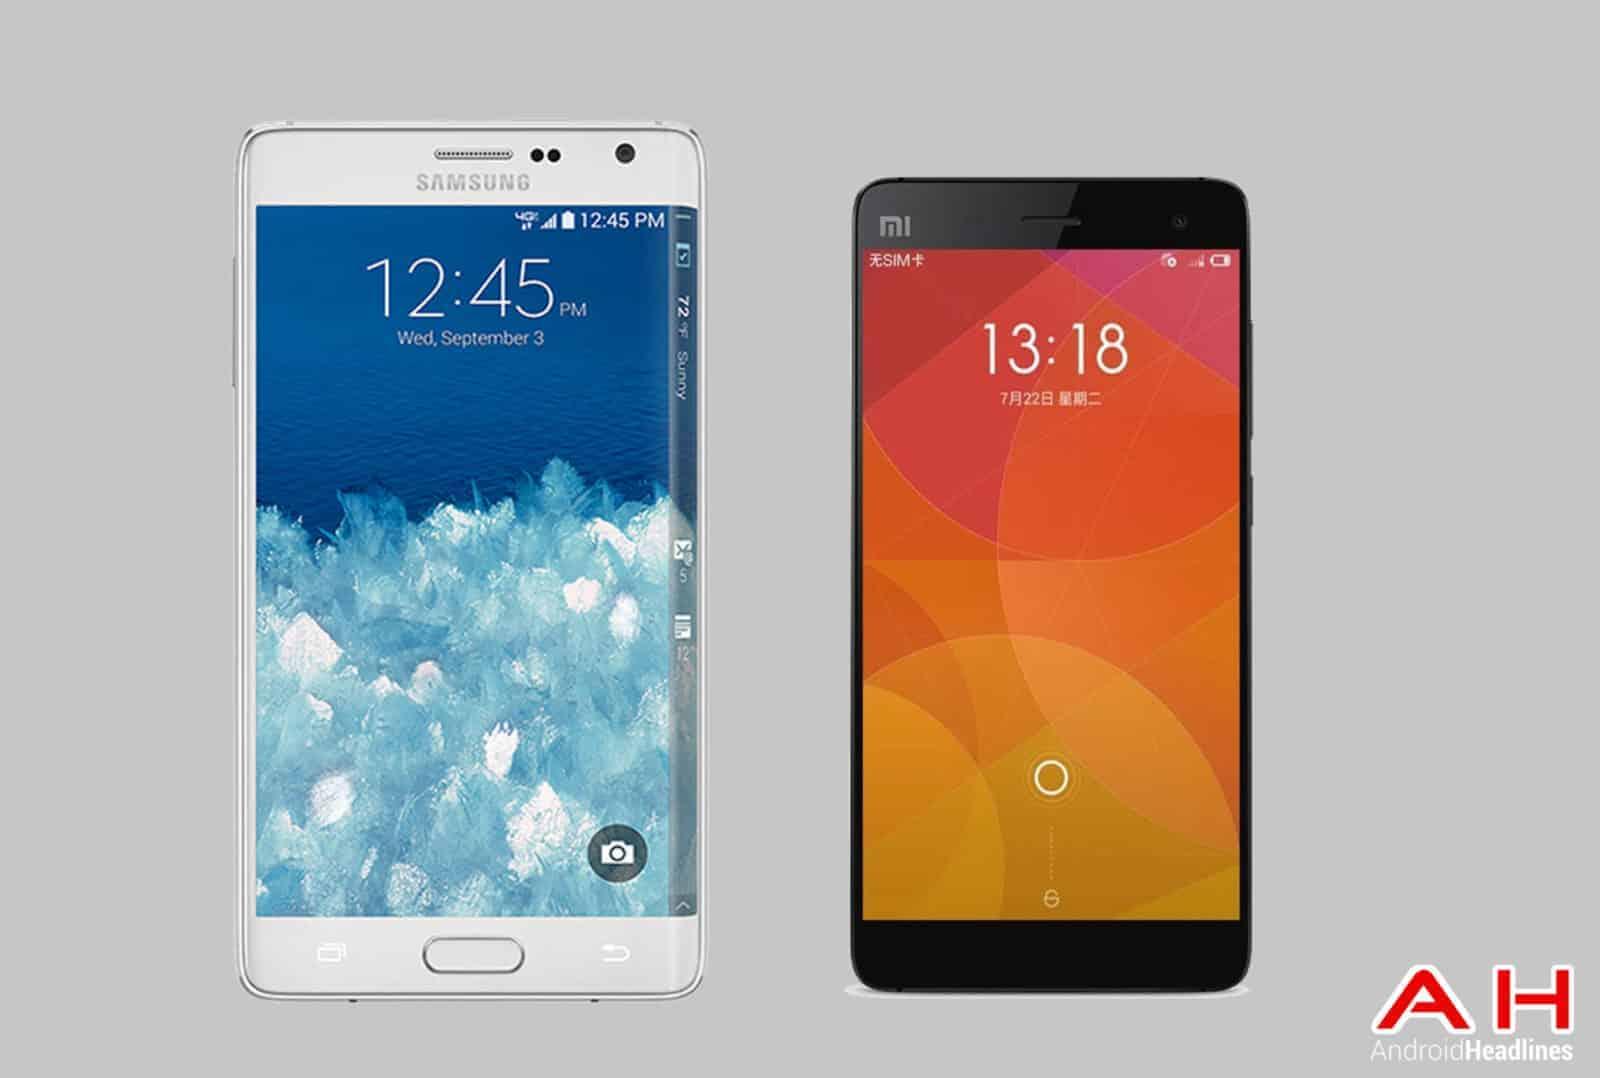 Galaxy Note Edge vs Xiaomi Mi4 cam AH